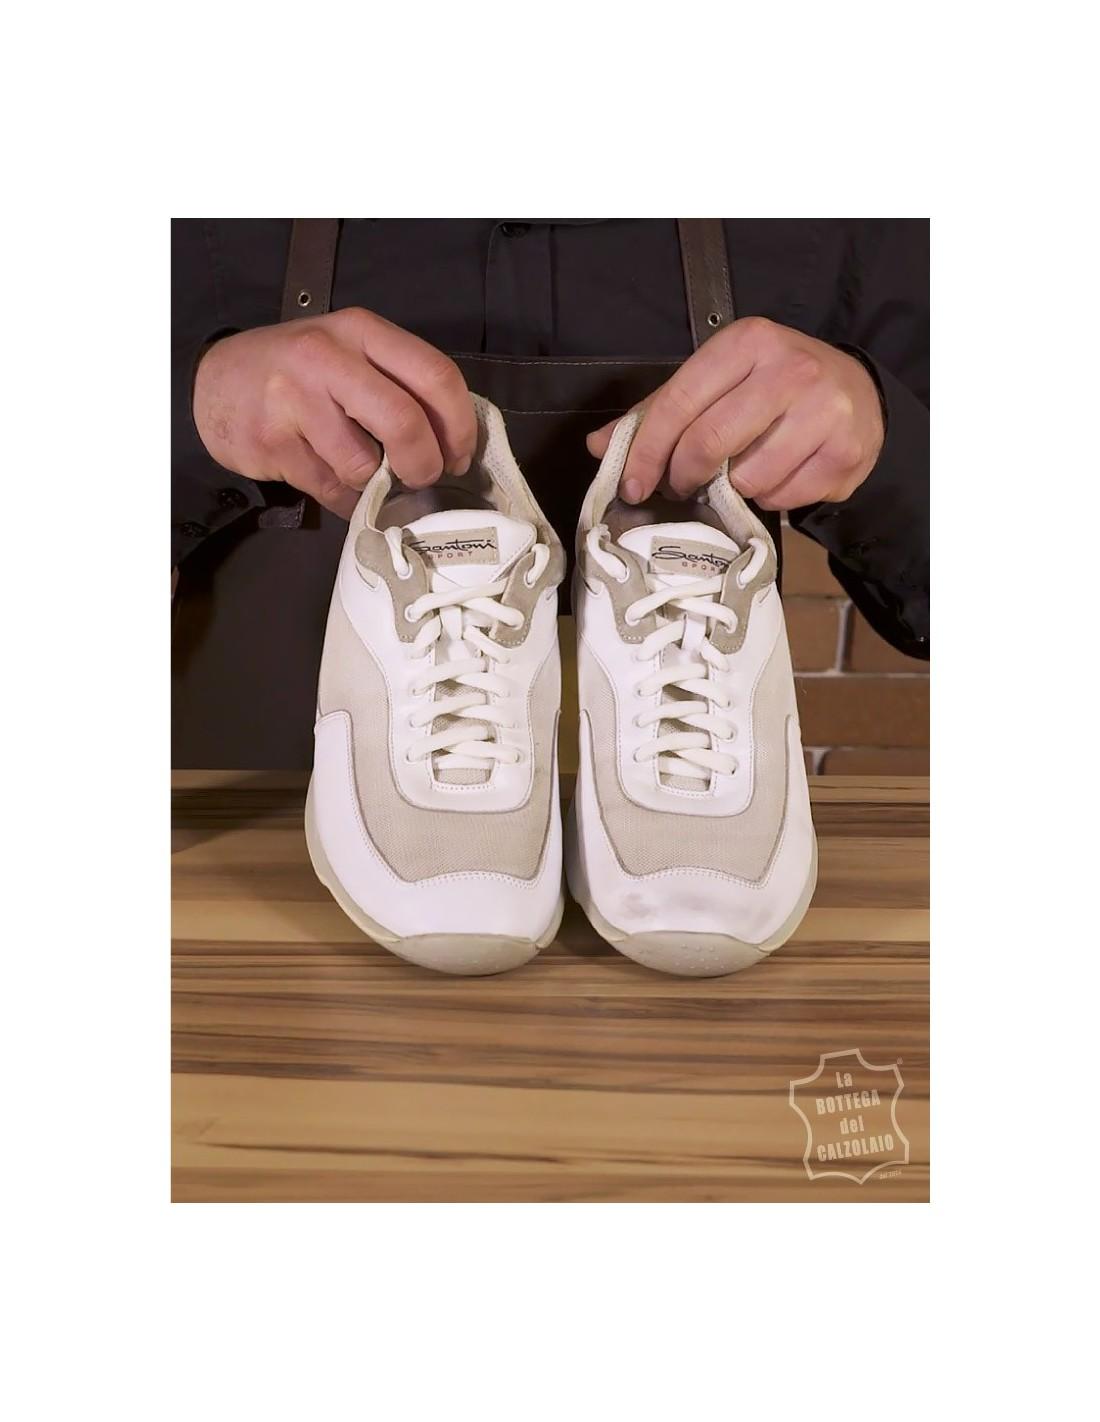 Kit per pulire scarpe bianche in pelle e sneakers in tela o